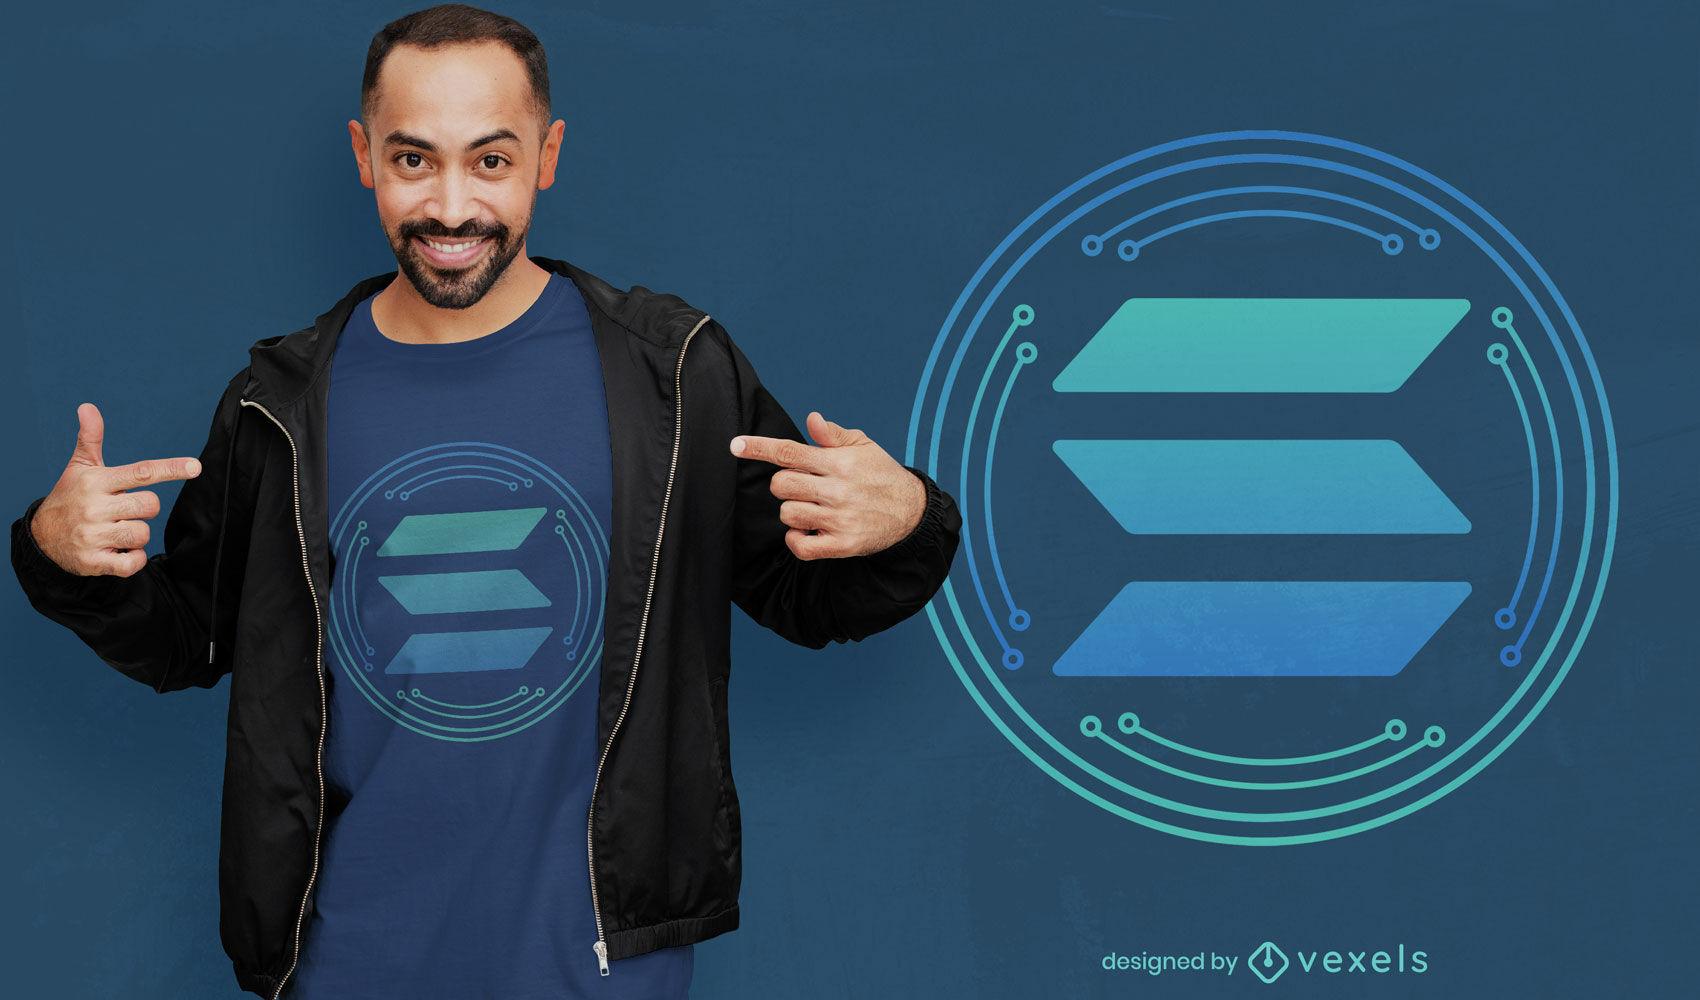 Solana crypto currency symbol t-shirt design